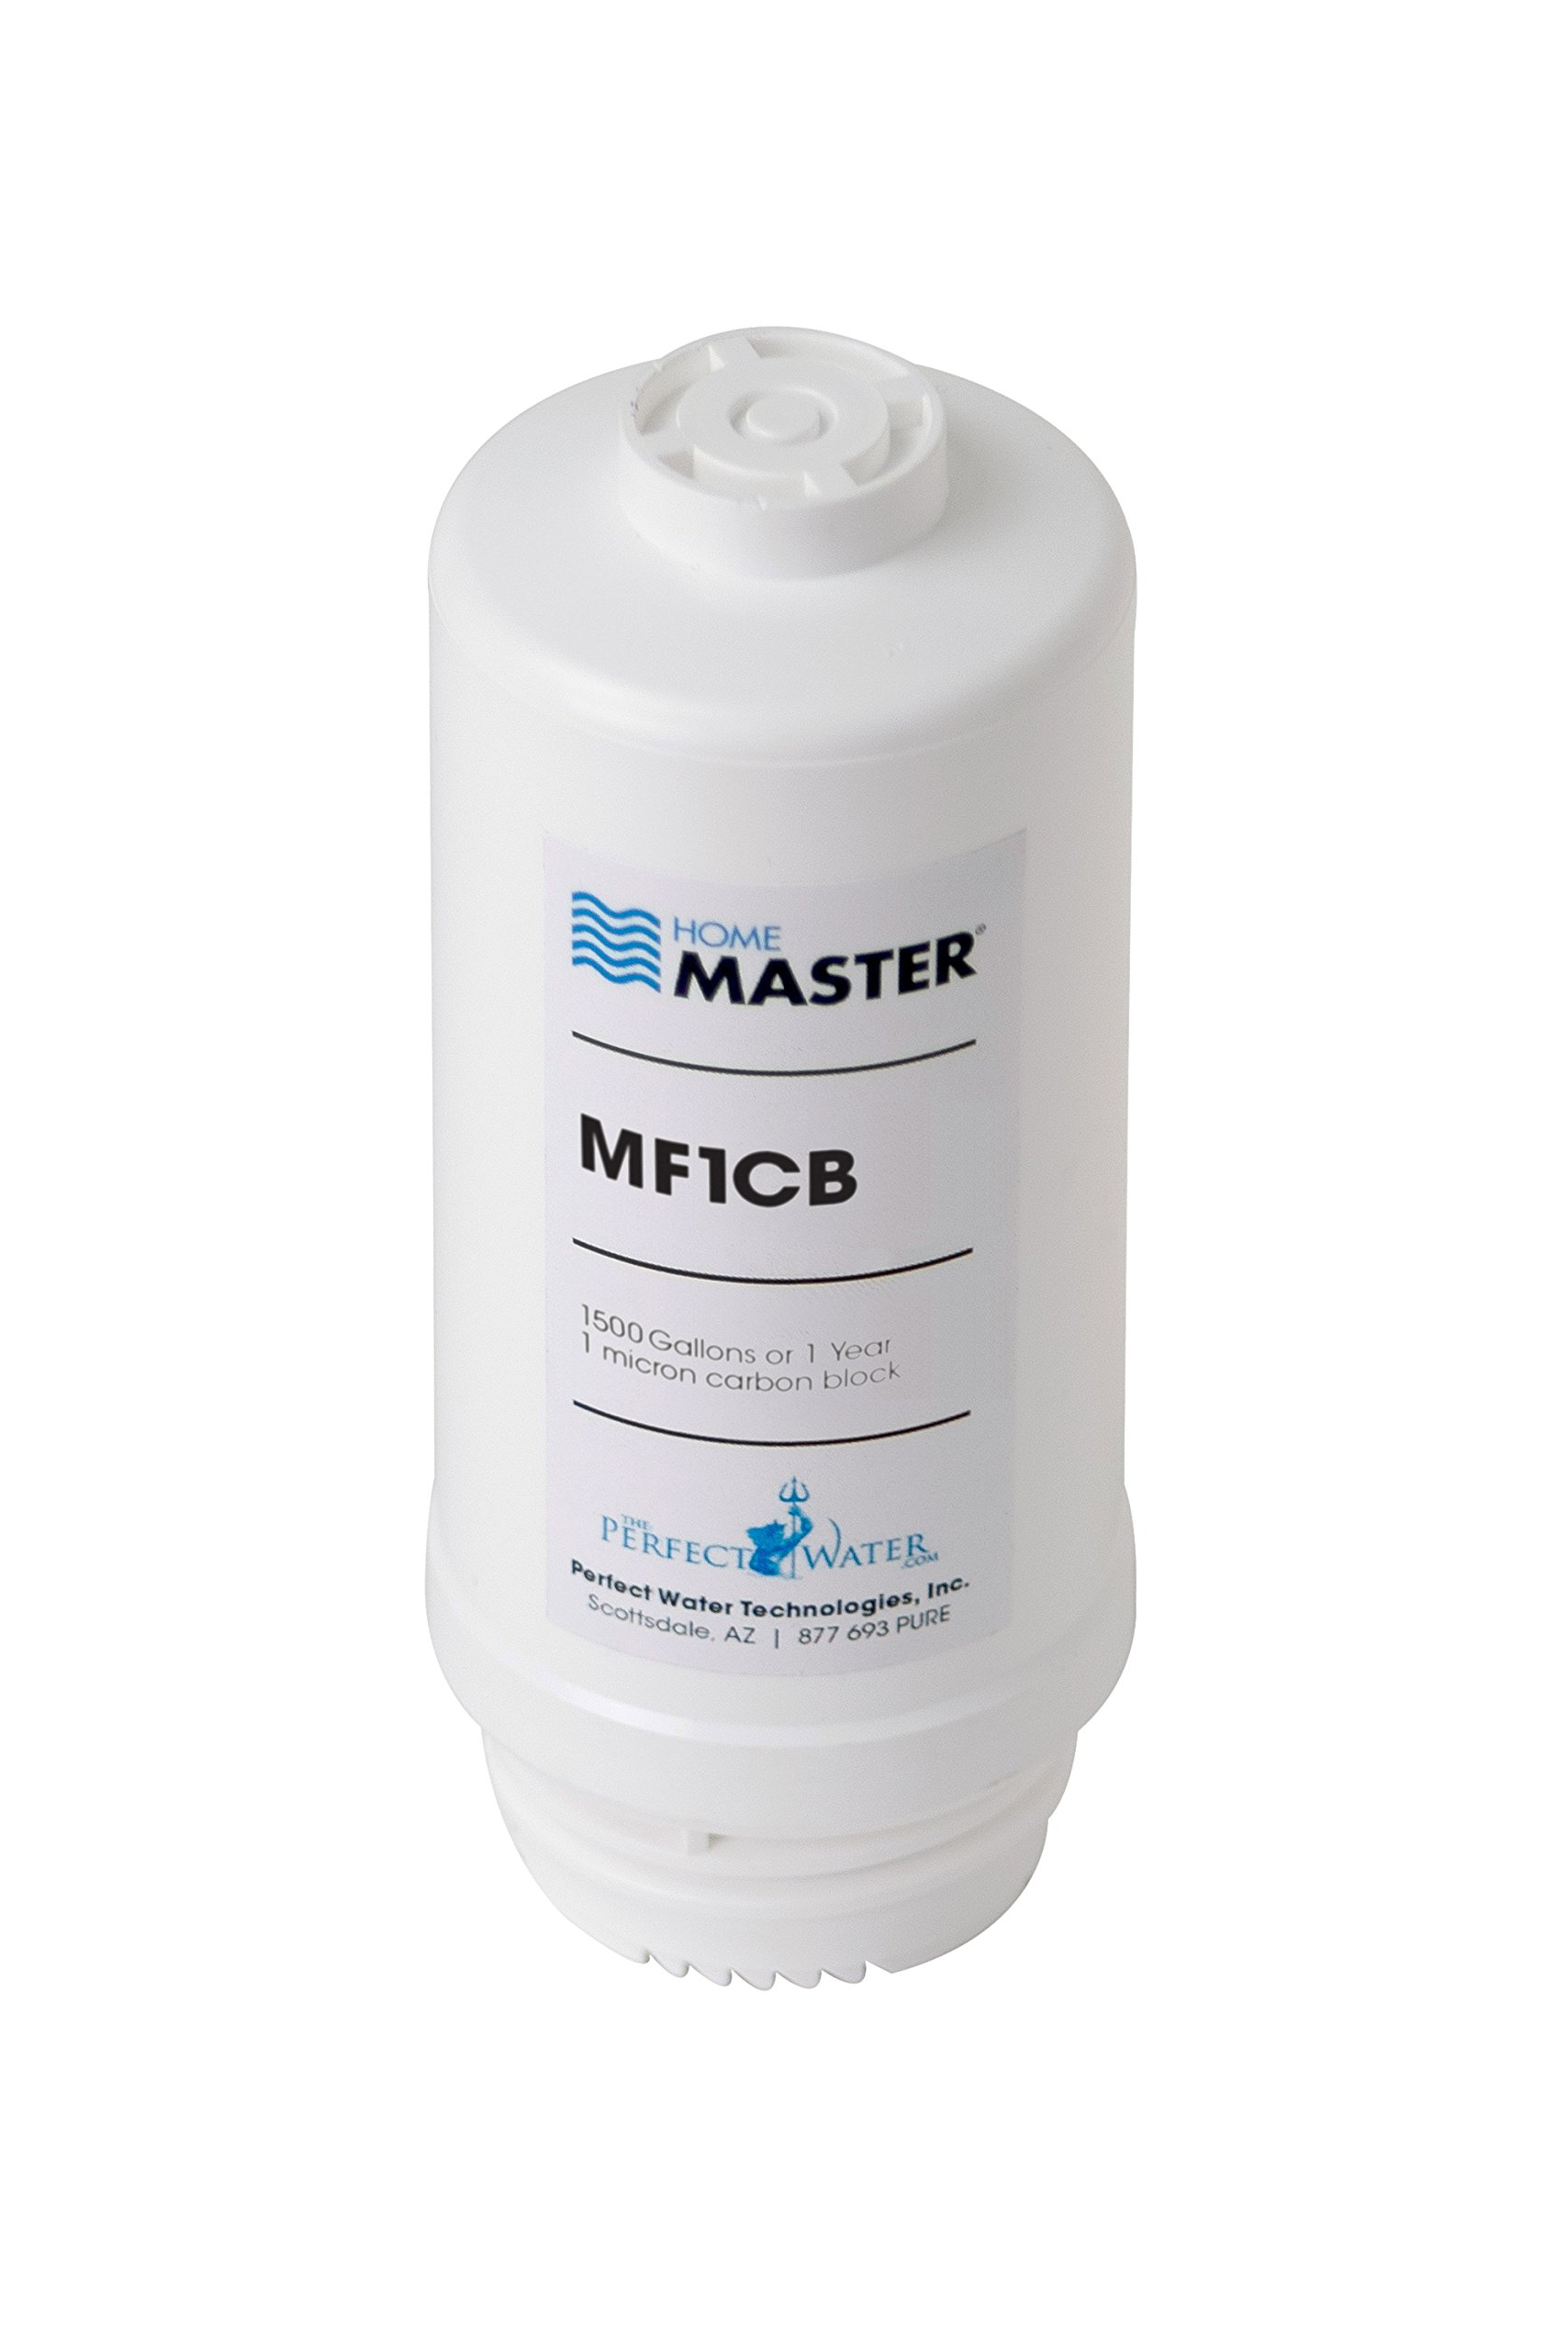 Home Master MF1CB Mini Replacement Filter, White